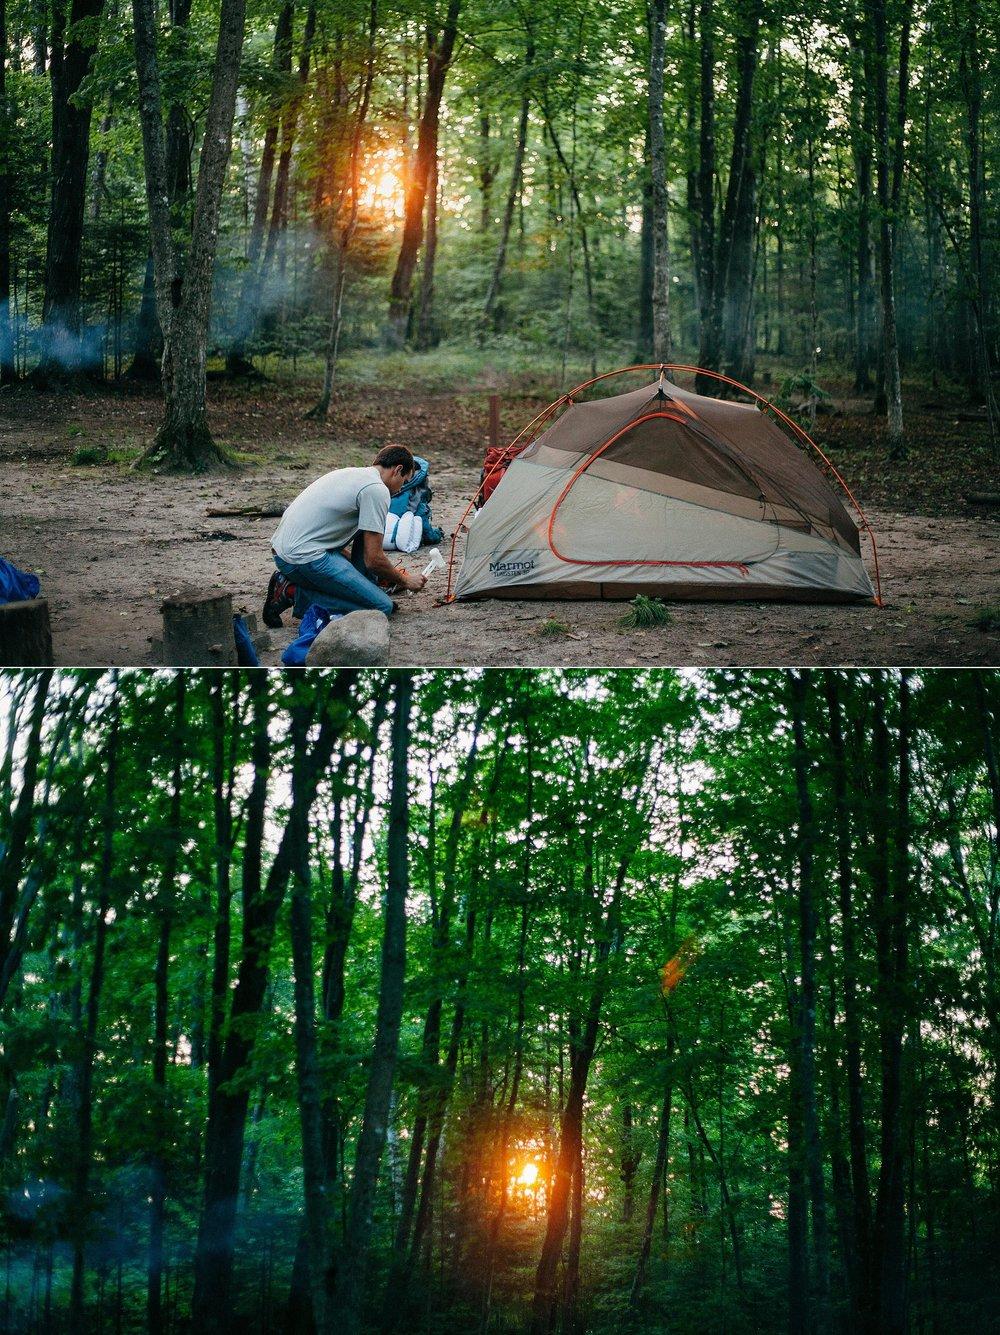 backpacking-michigan-upper-peninsula-pictured-rocks-camping-lake-superior_0013.jpg